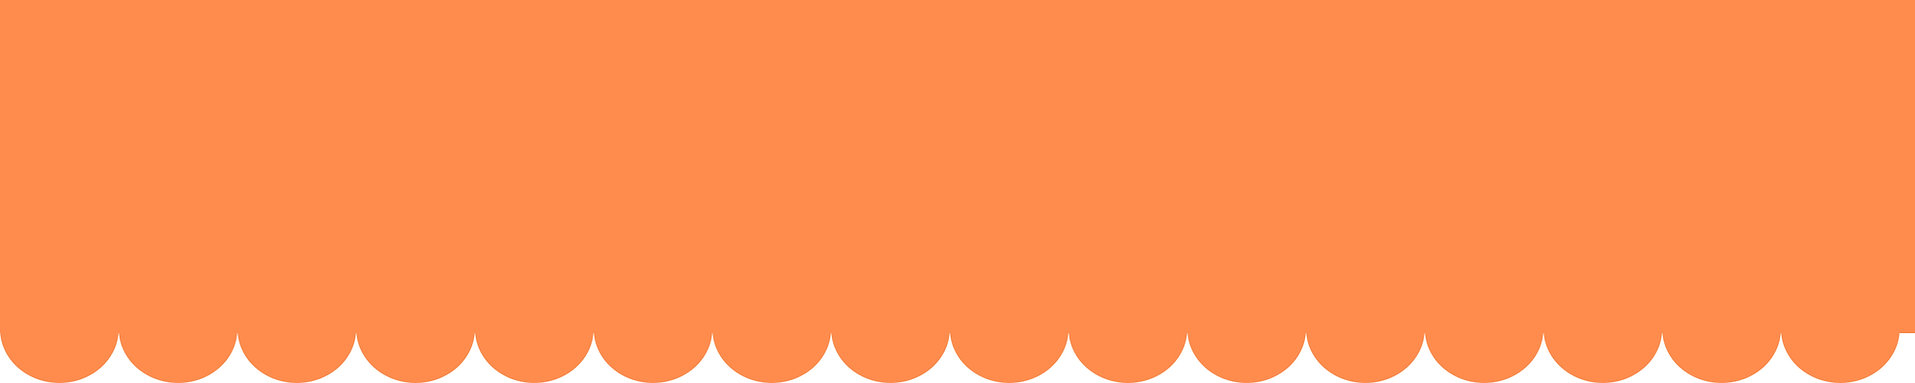 header orange .jpg